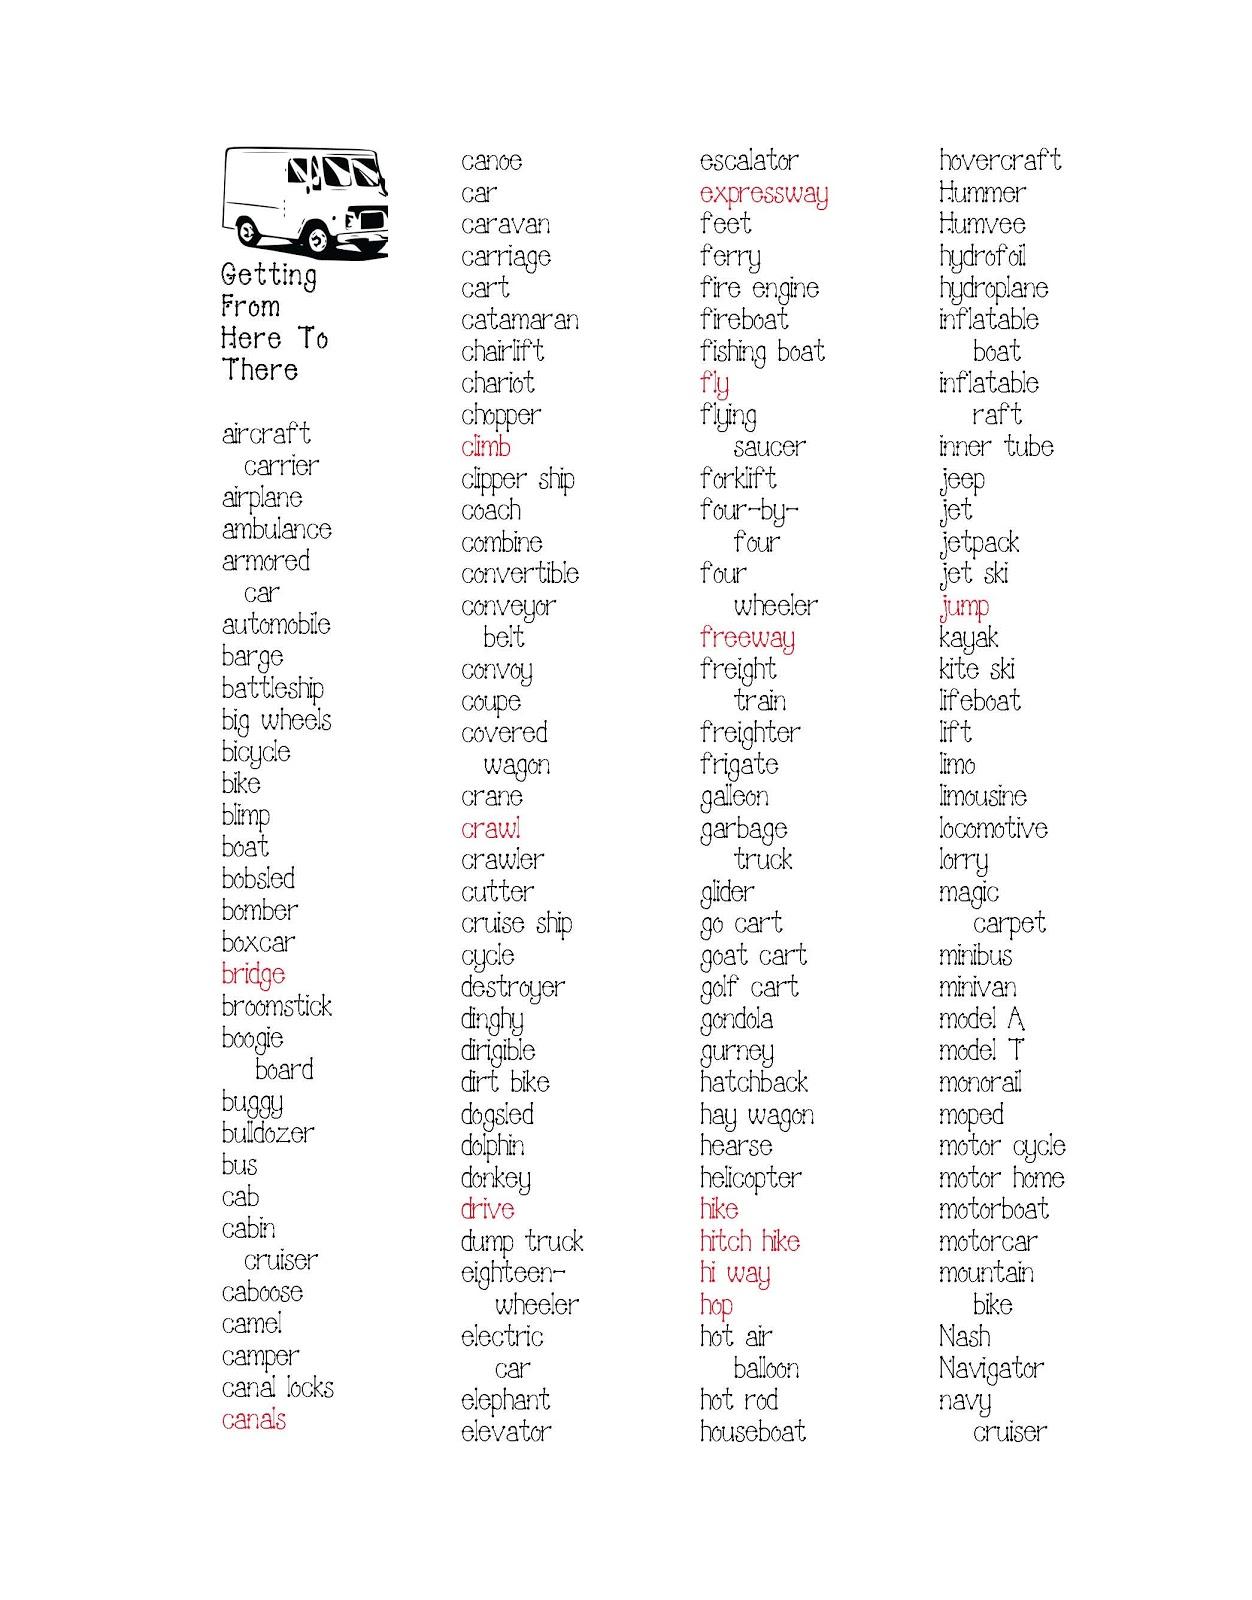 Alphabetical List Of 240 Modes of Transportation - Classroom